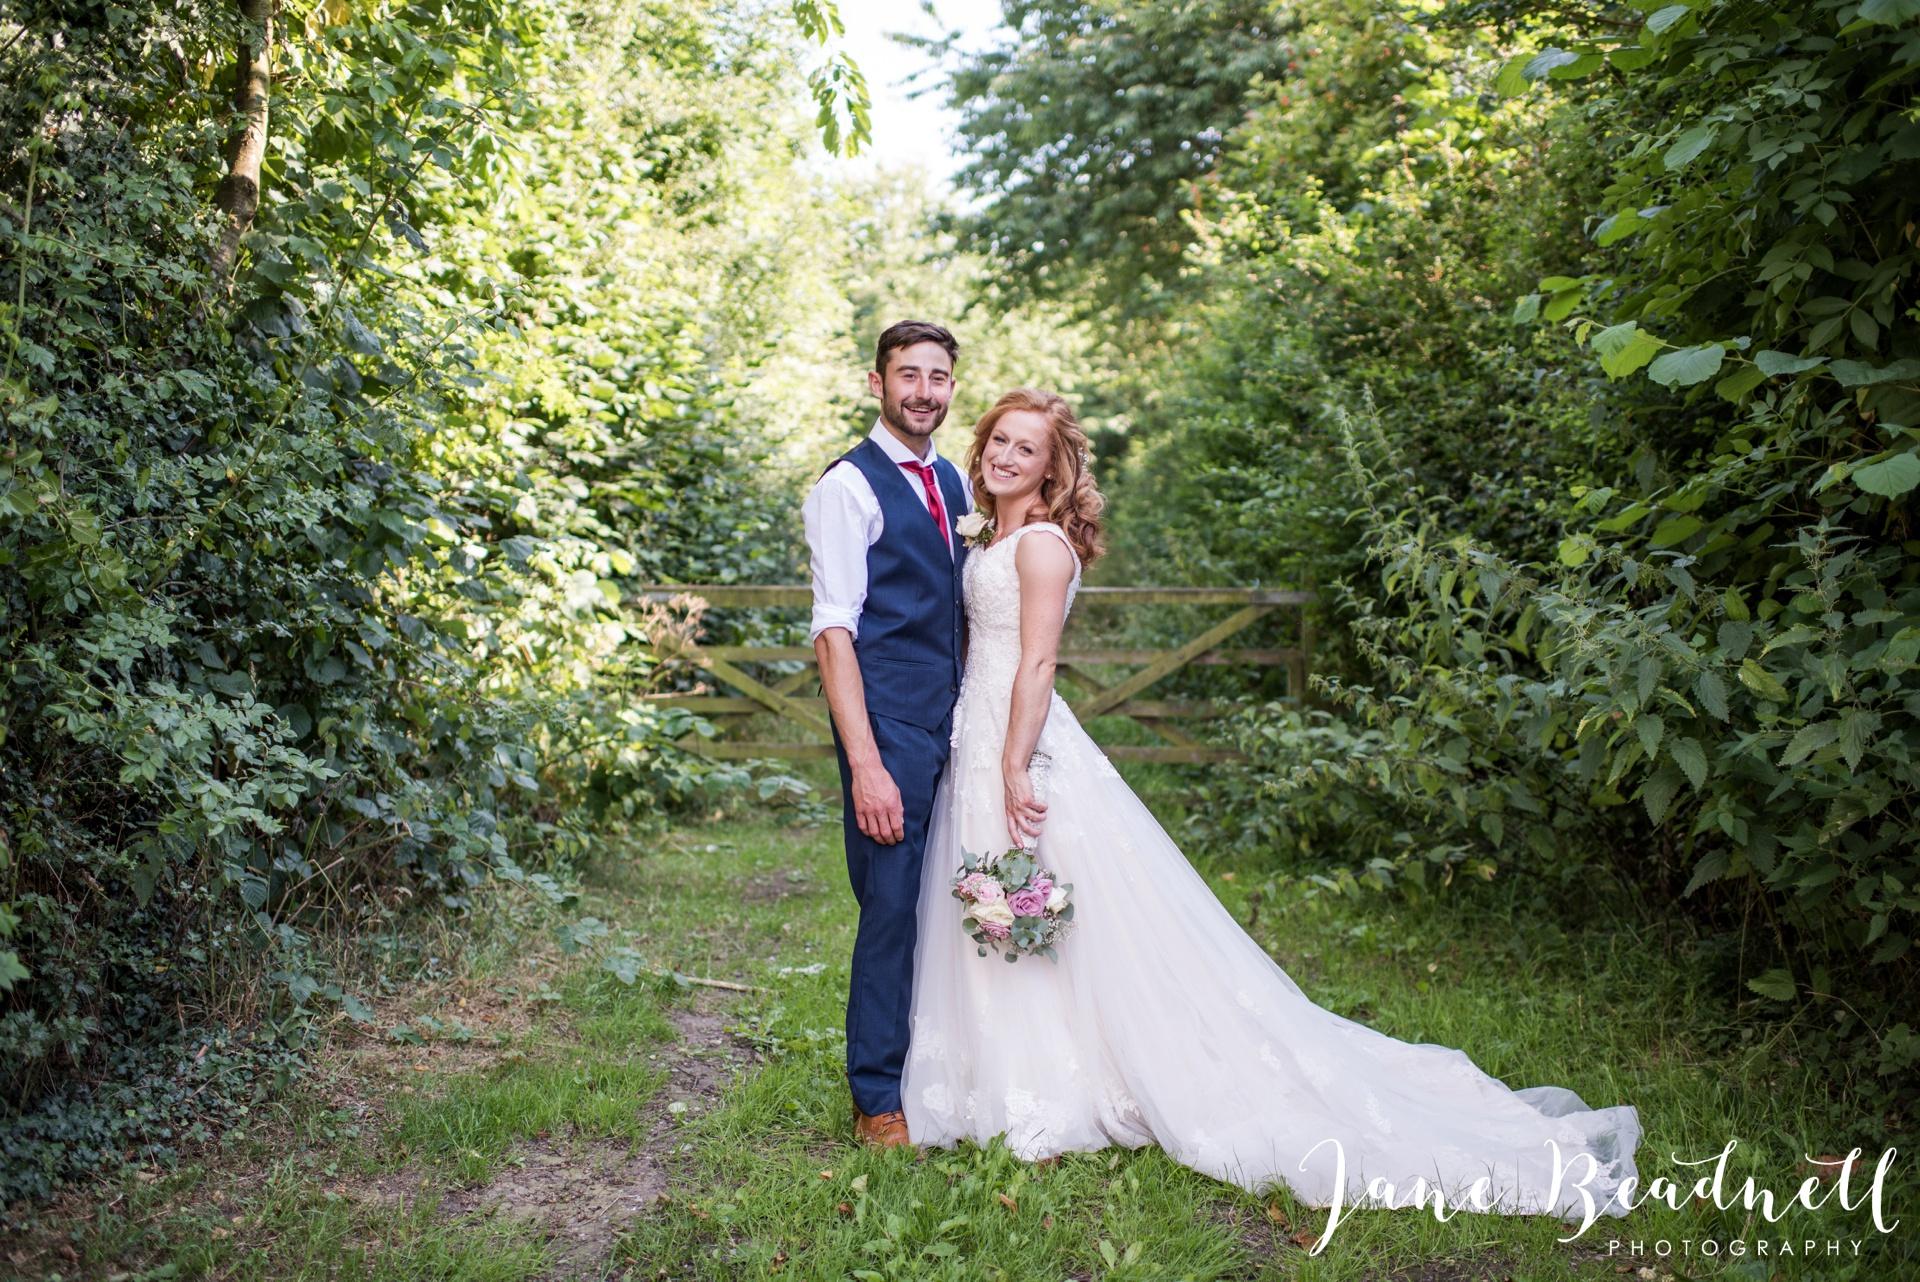 yorkshire-fine-art-wedding-photographer-jane-beadnell-photography-poppleton-york_0099